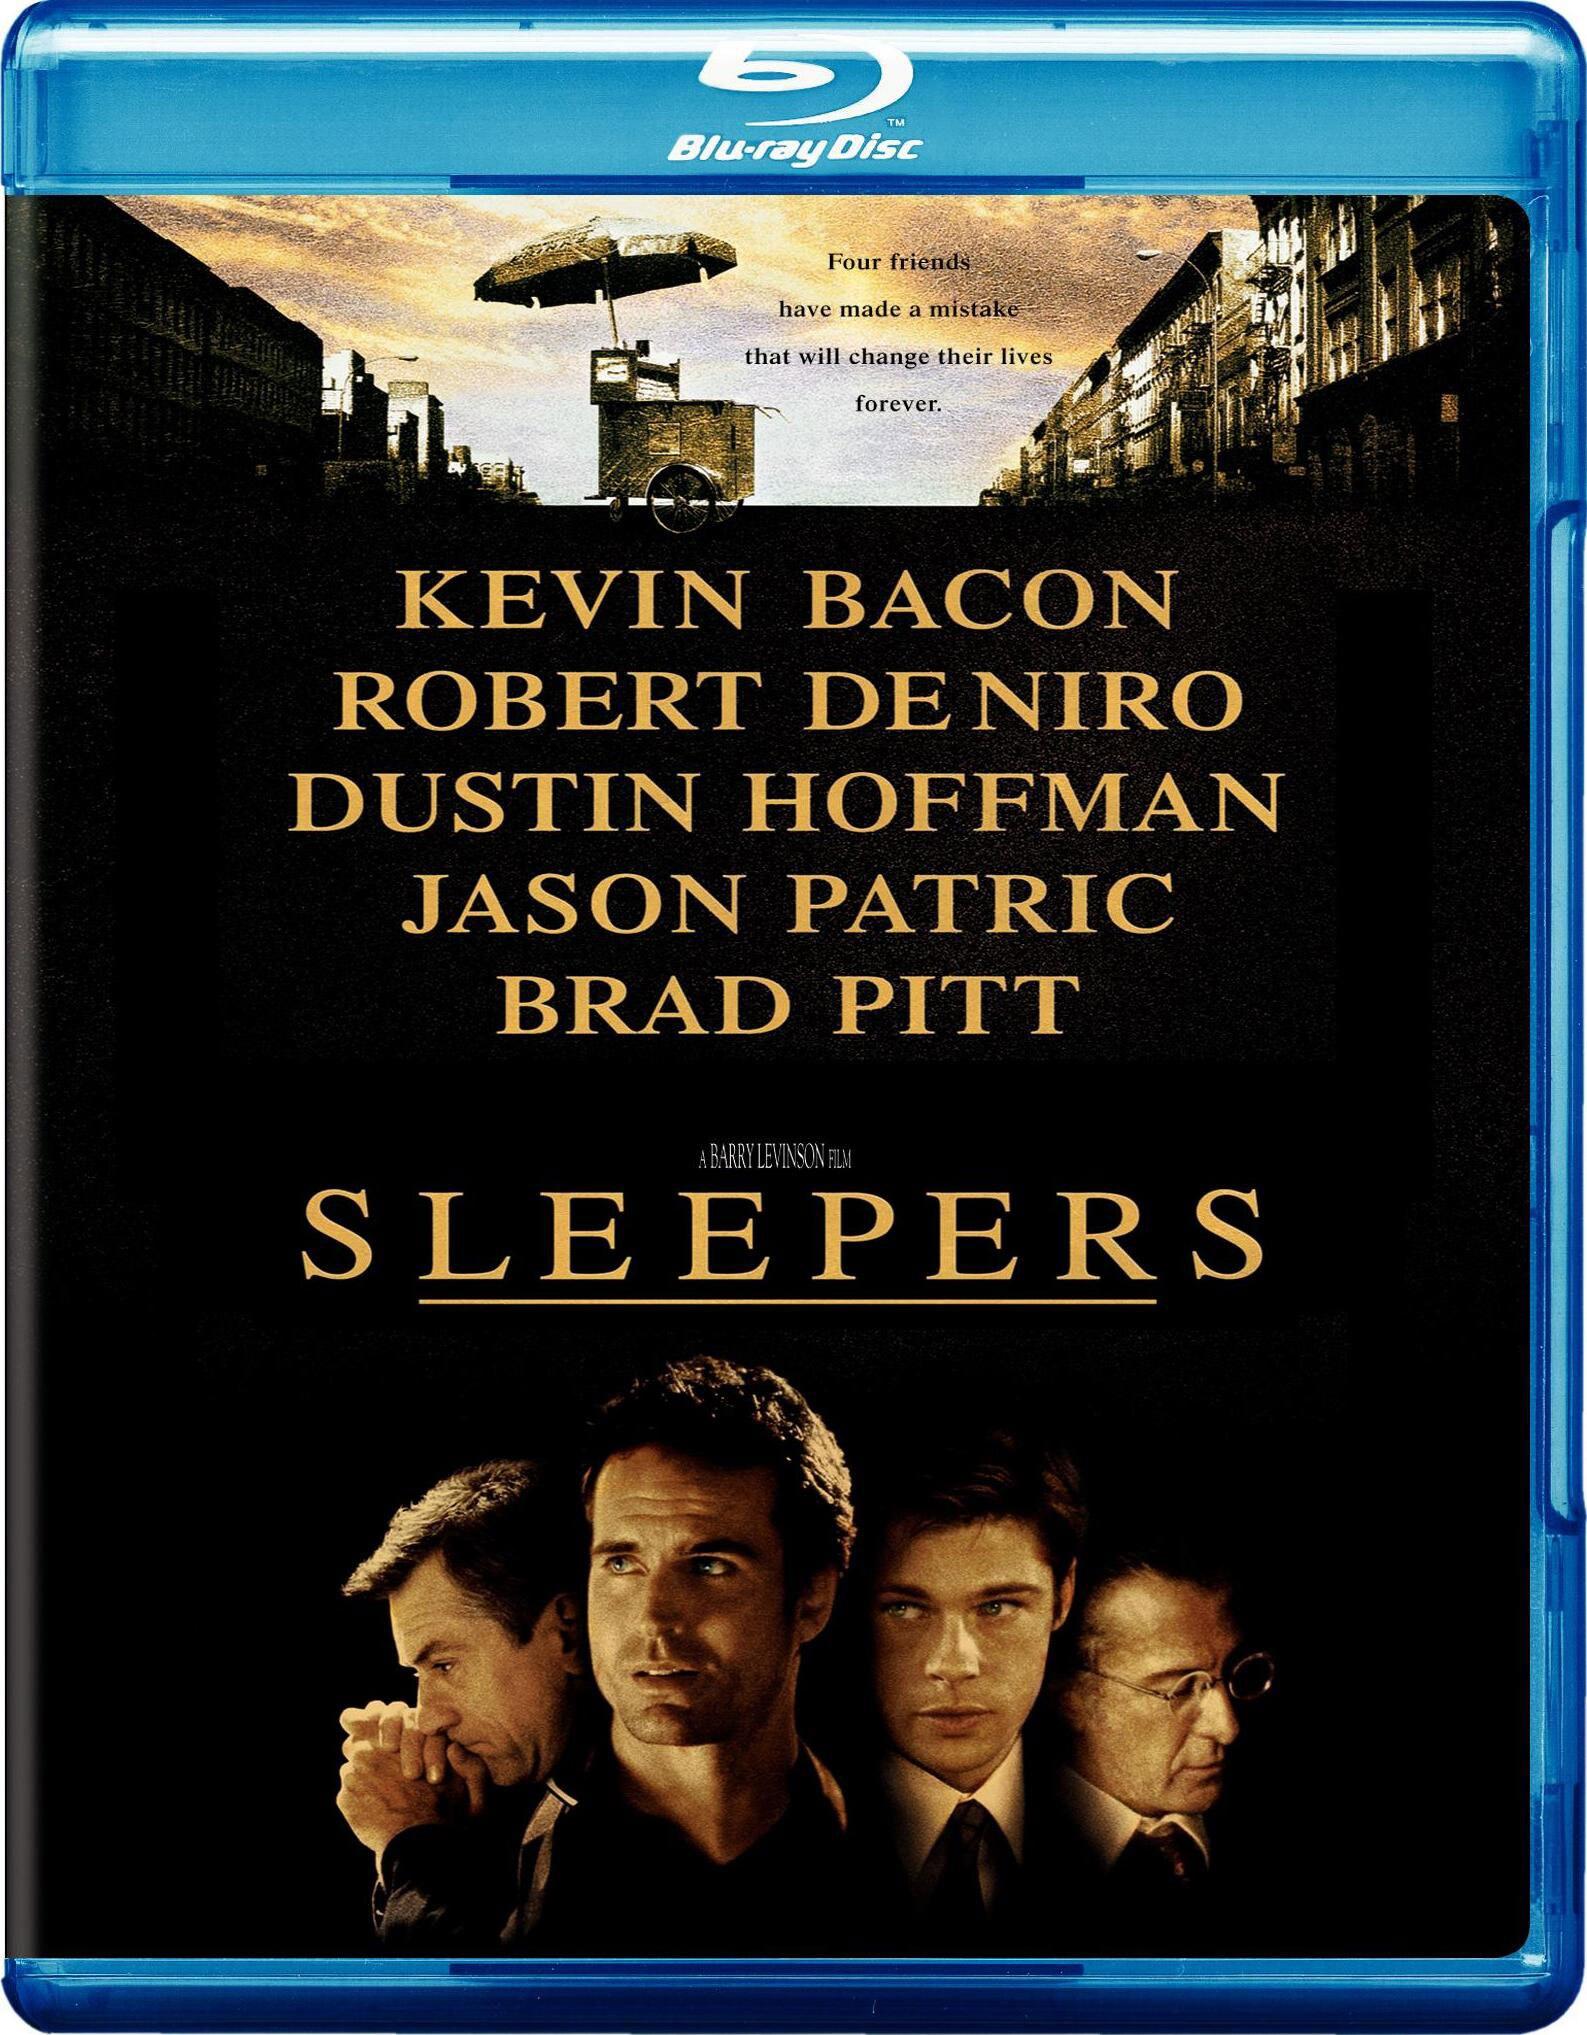 Sleepers (Blu-ray Disc)